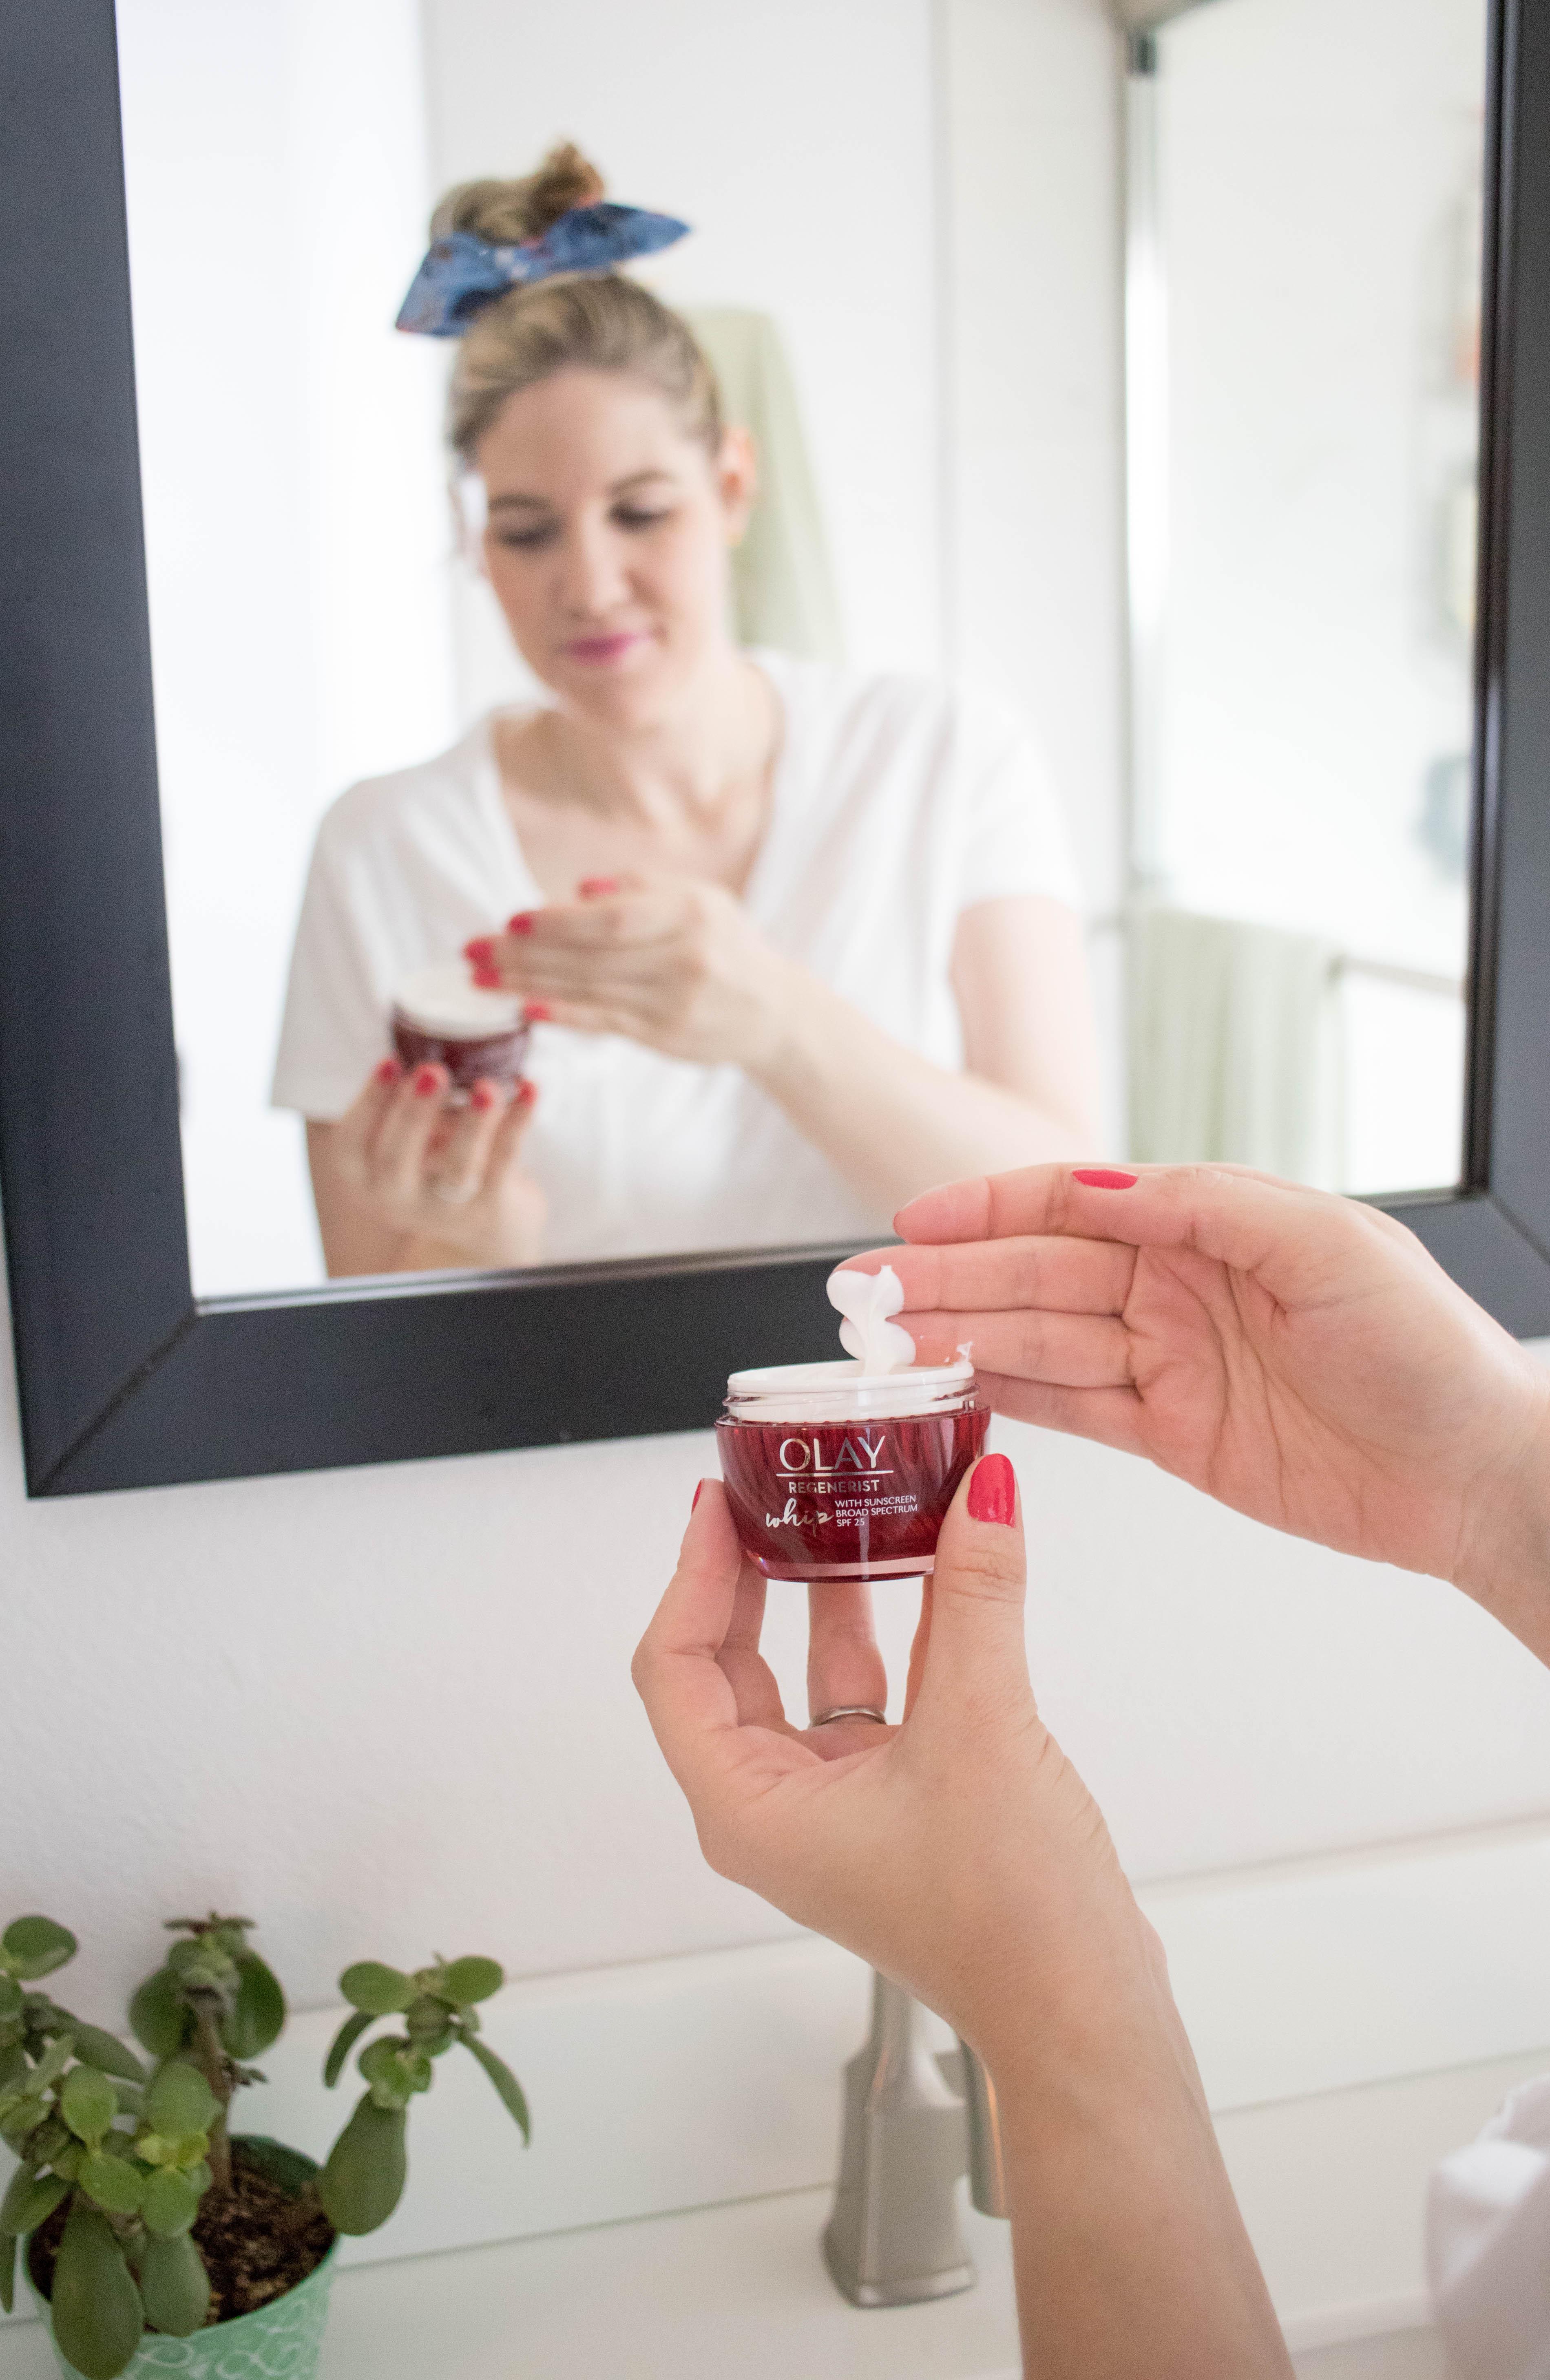 olay whip moisturizer review #olaywhip #olay #skincareroutine